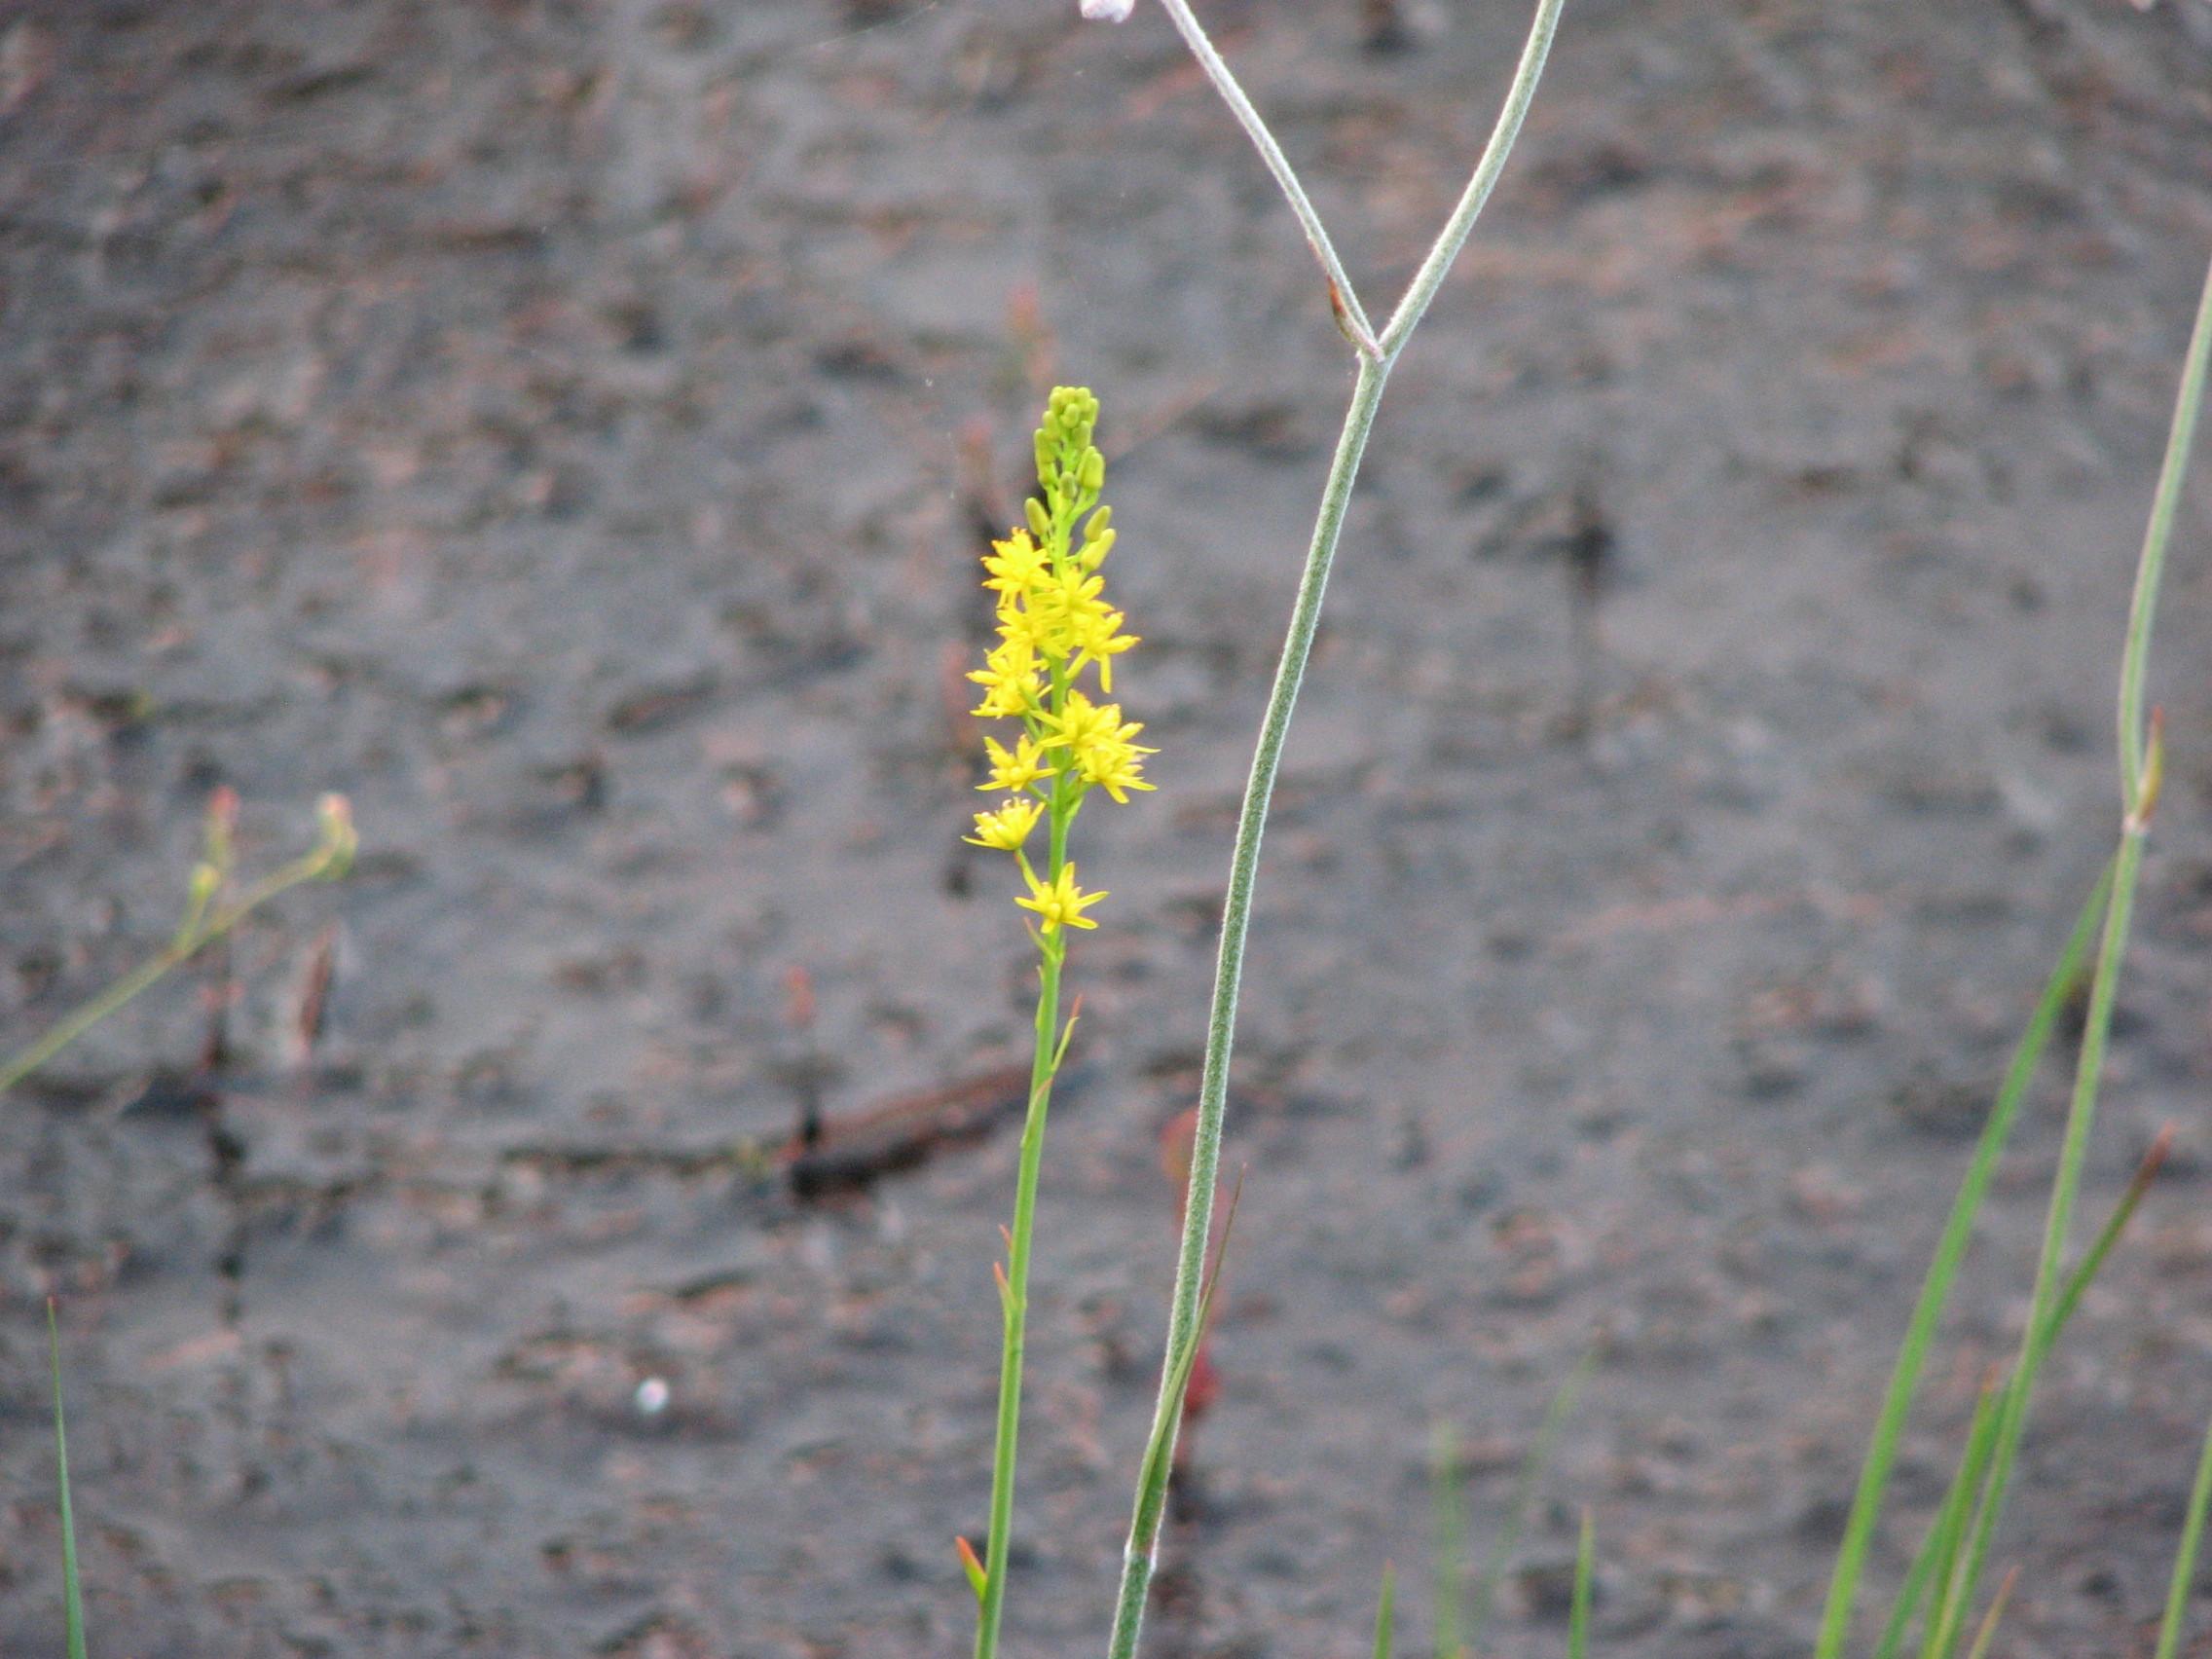 Image of yellow asphodel